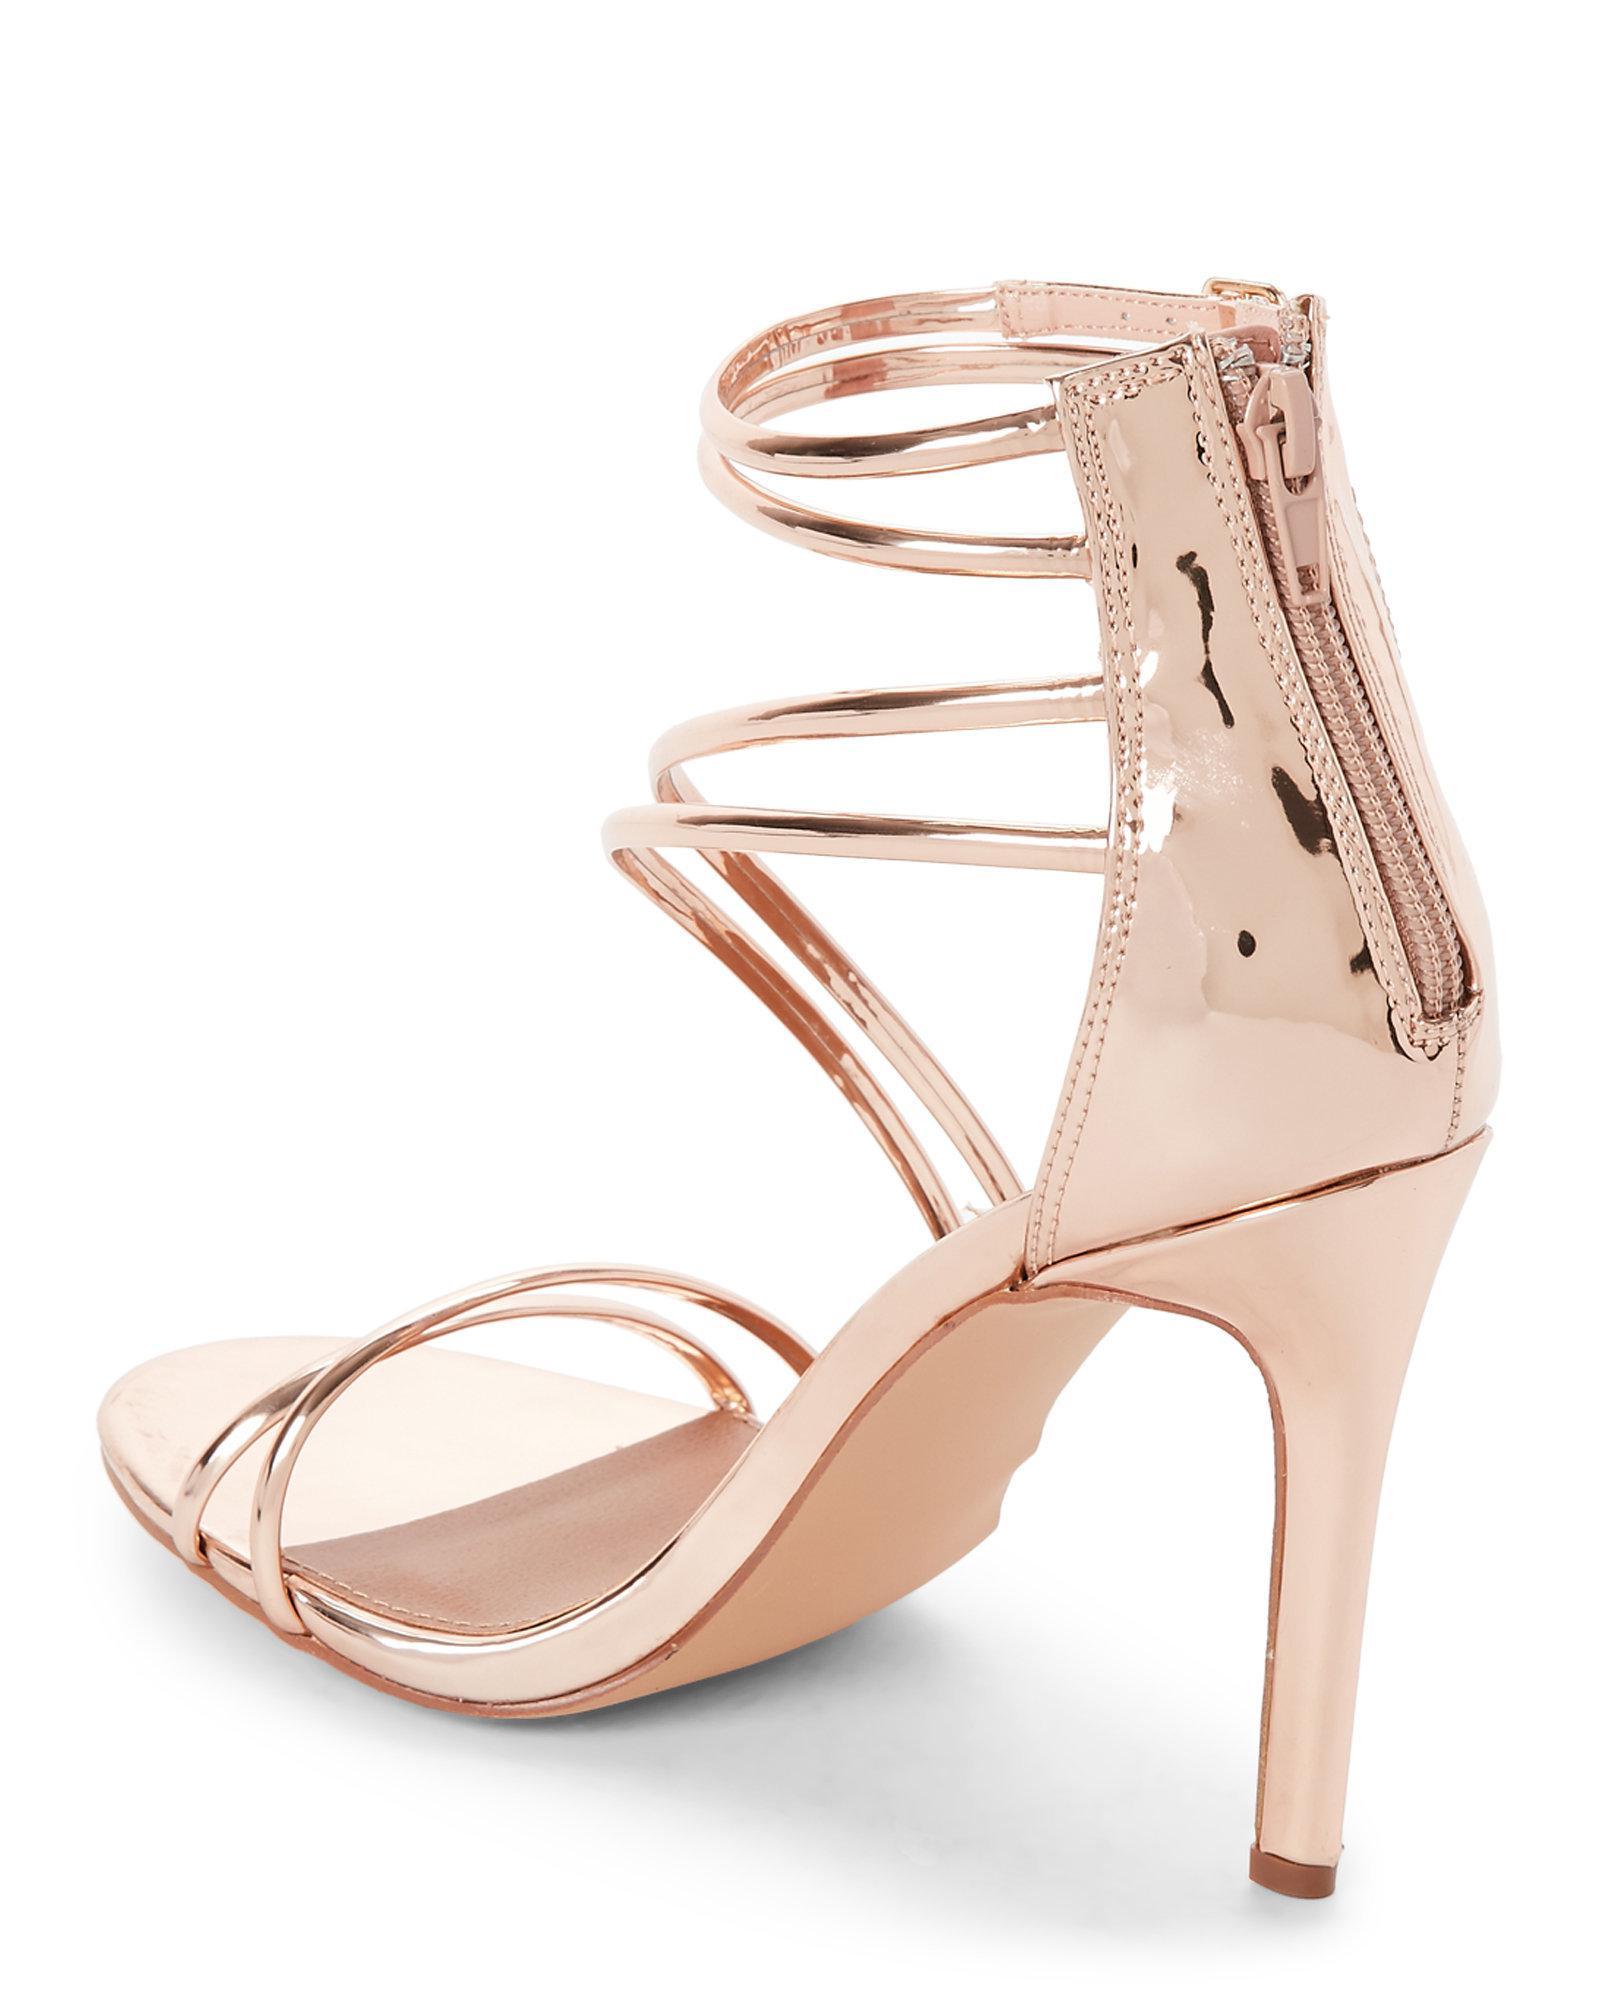 046504d7379 Steve Madden Multicolor Fico Tube Strap High Heel Sandals